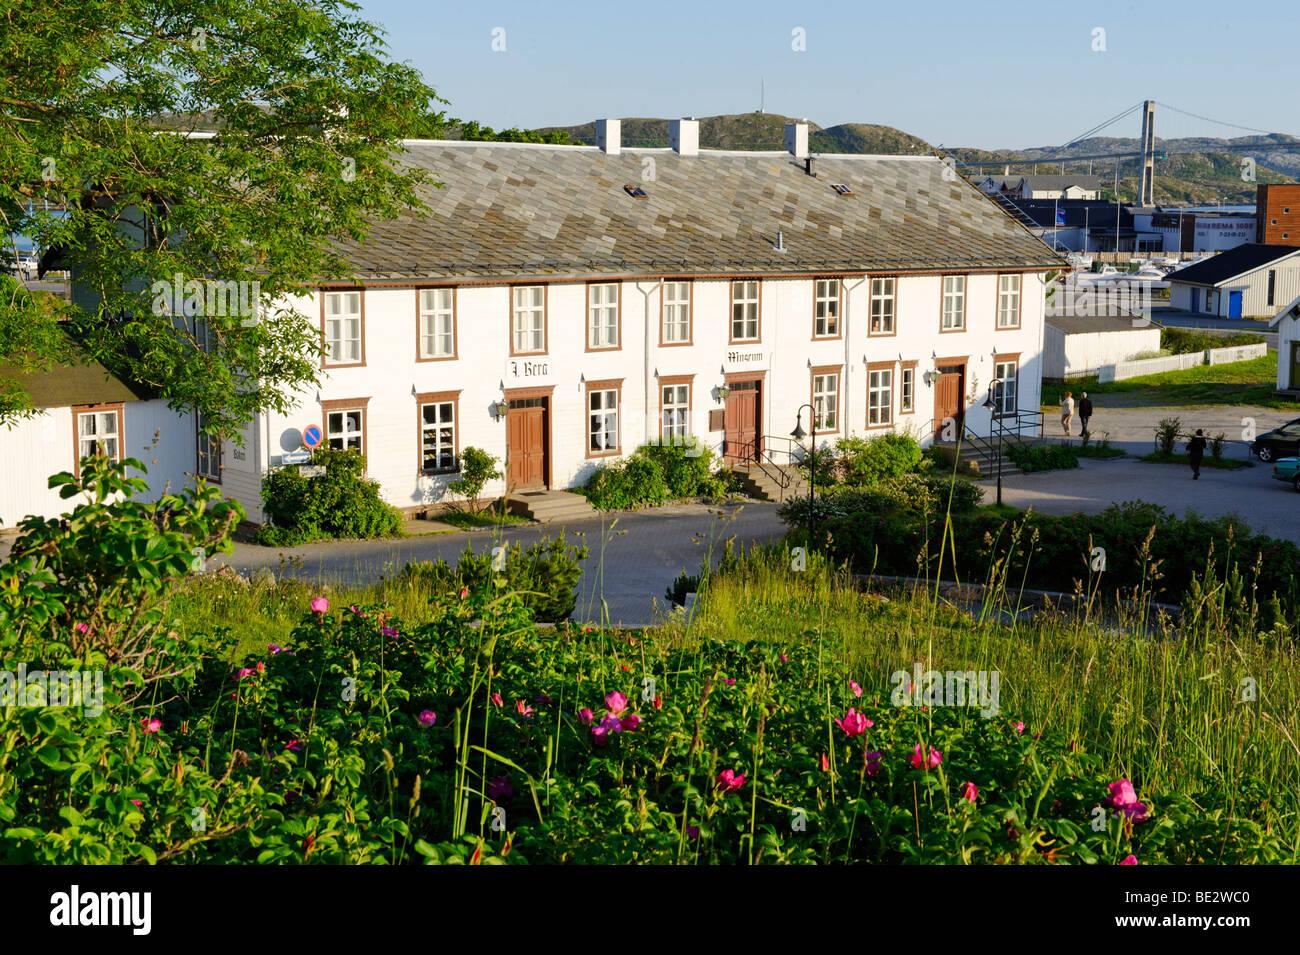 Former trade station Berggarden, now local museum, Rorvik, Norway, Scandinavia, Europe - Stock Image